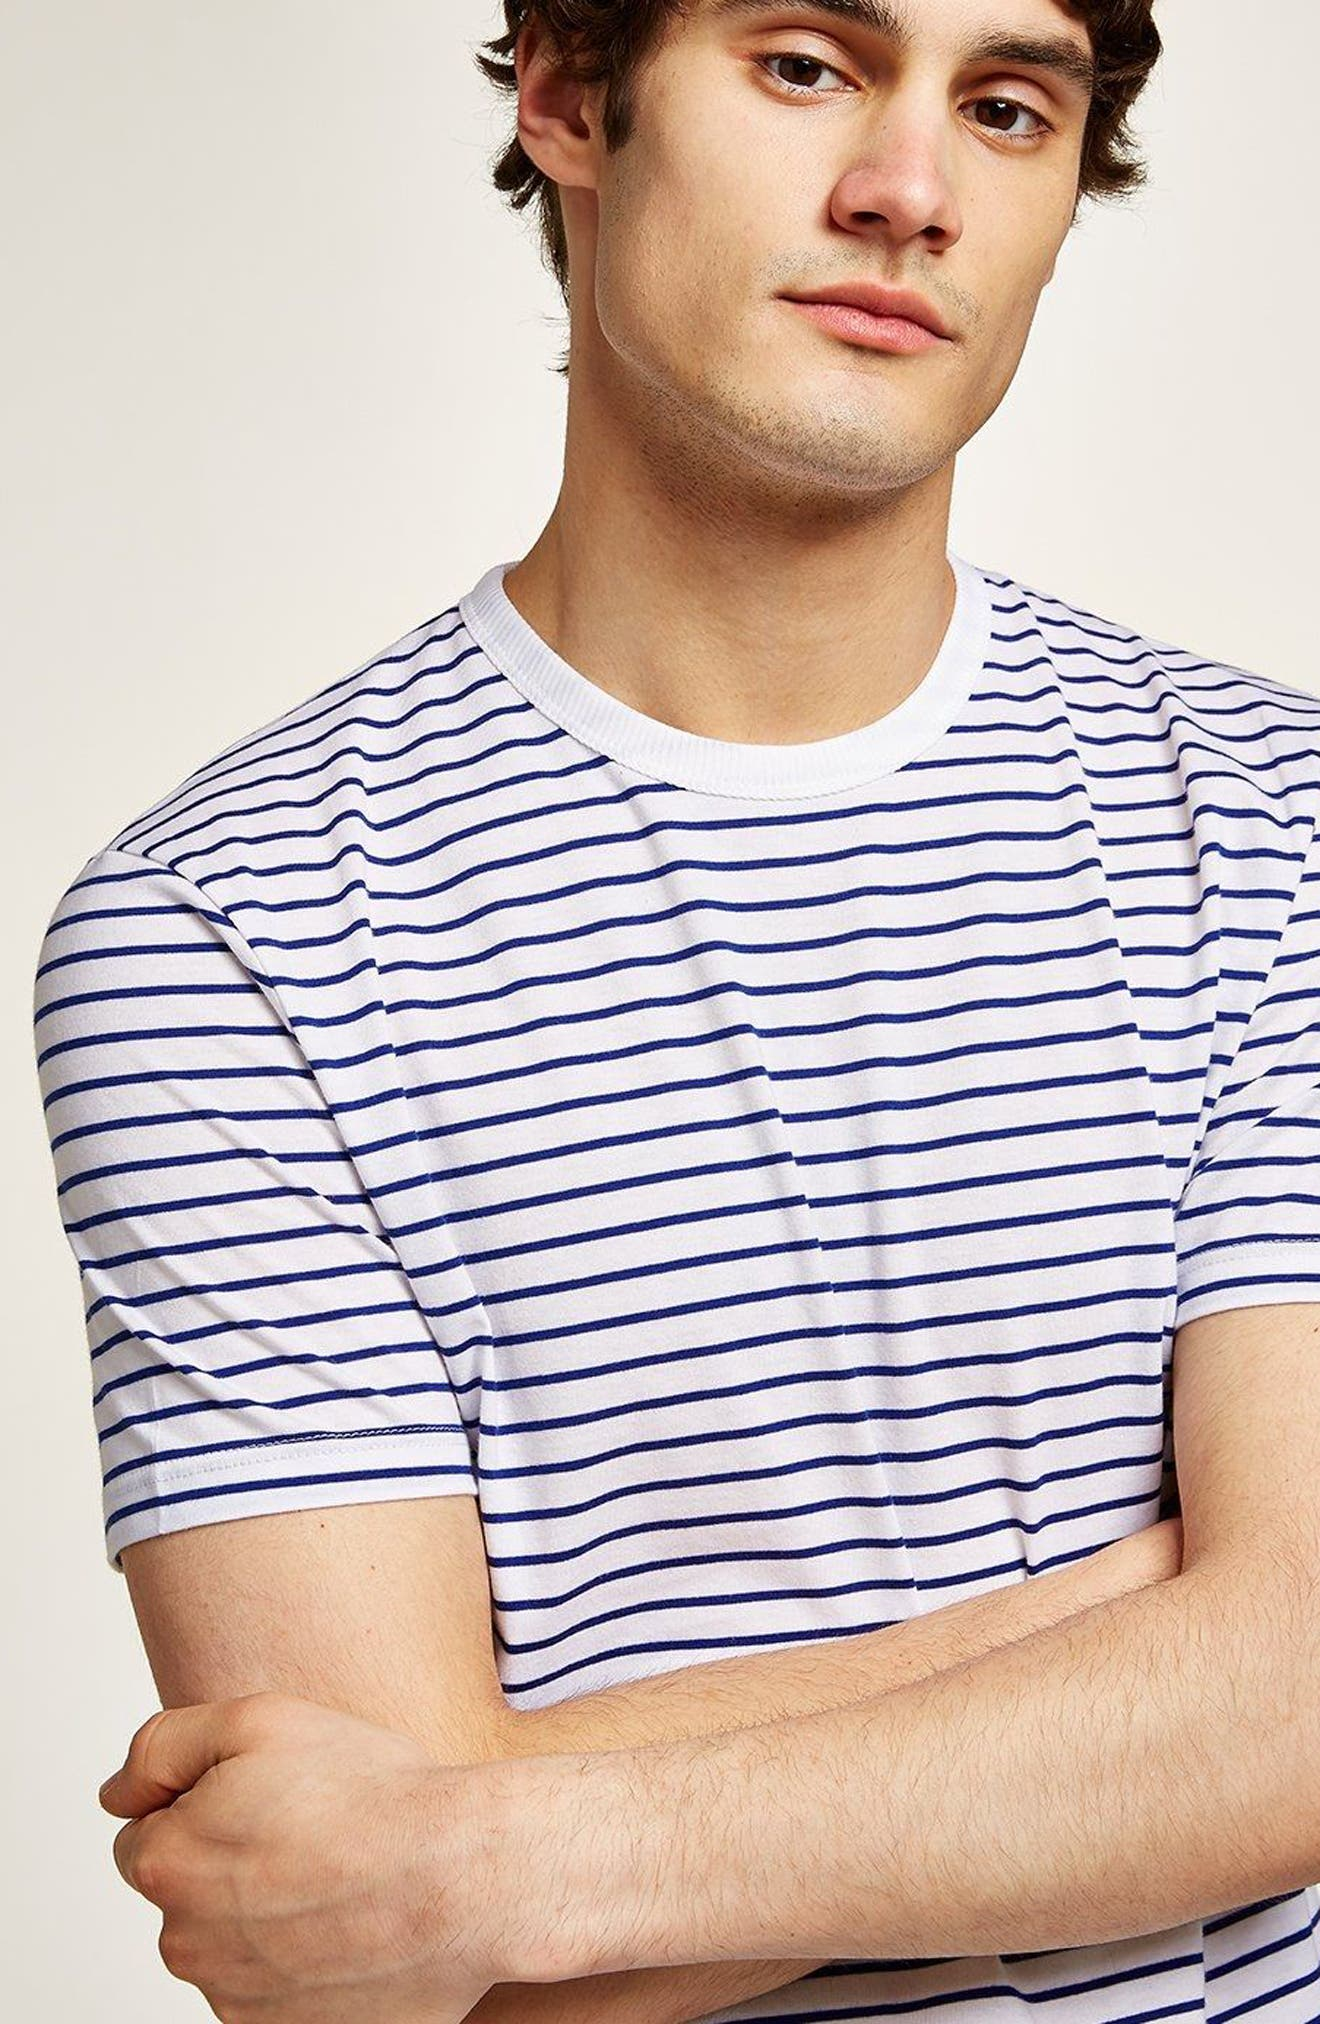 Slim Fit Stripe T-Shirt,                             Alternate thumbnail 4, color,                             DARK BLUE MULTI